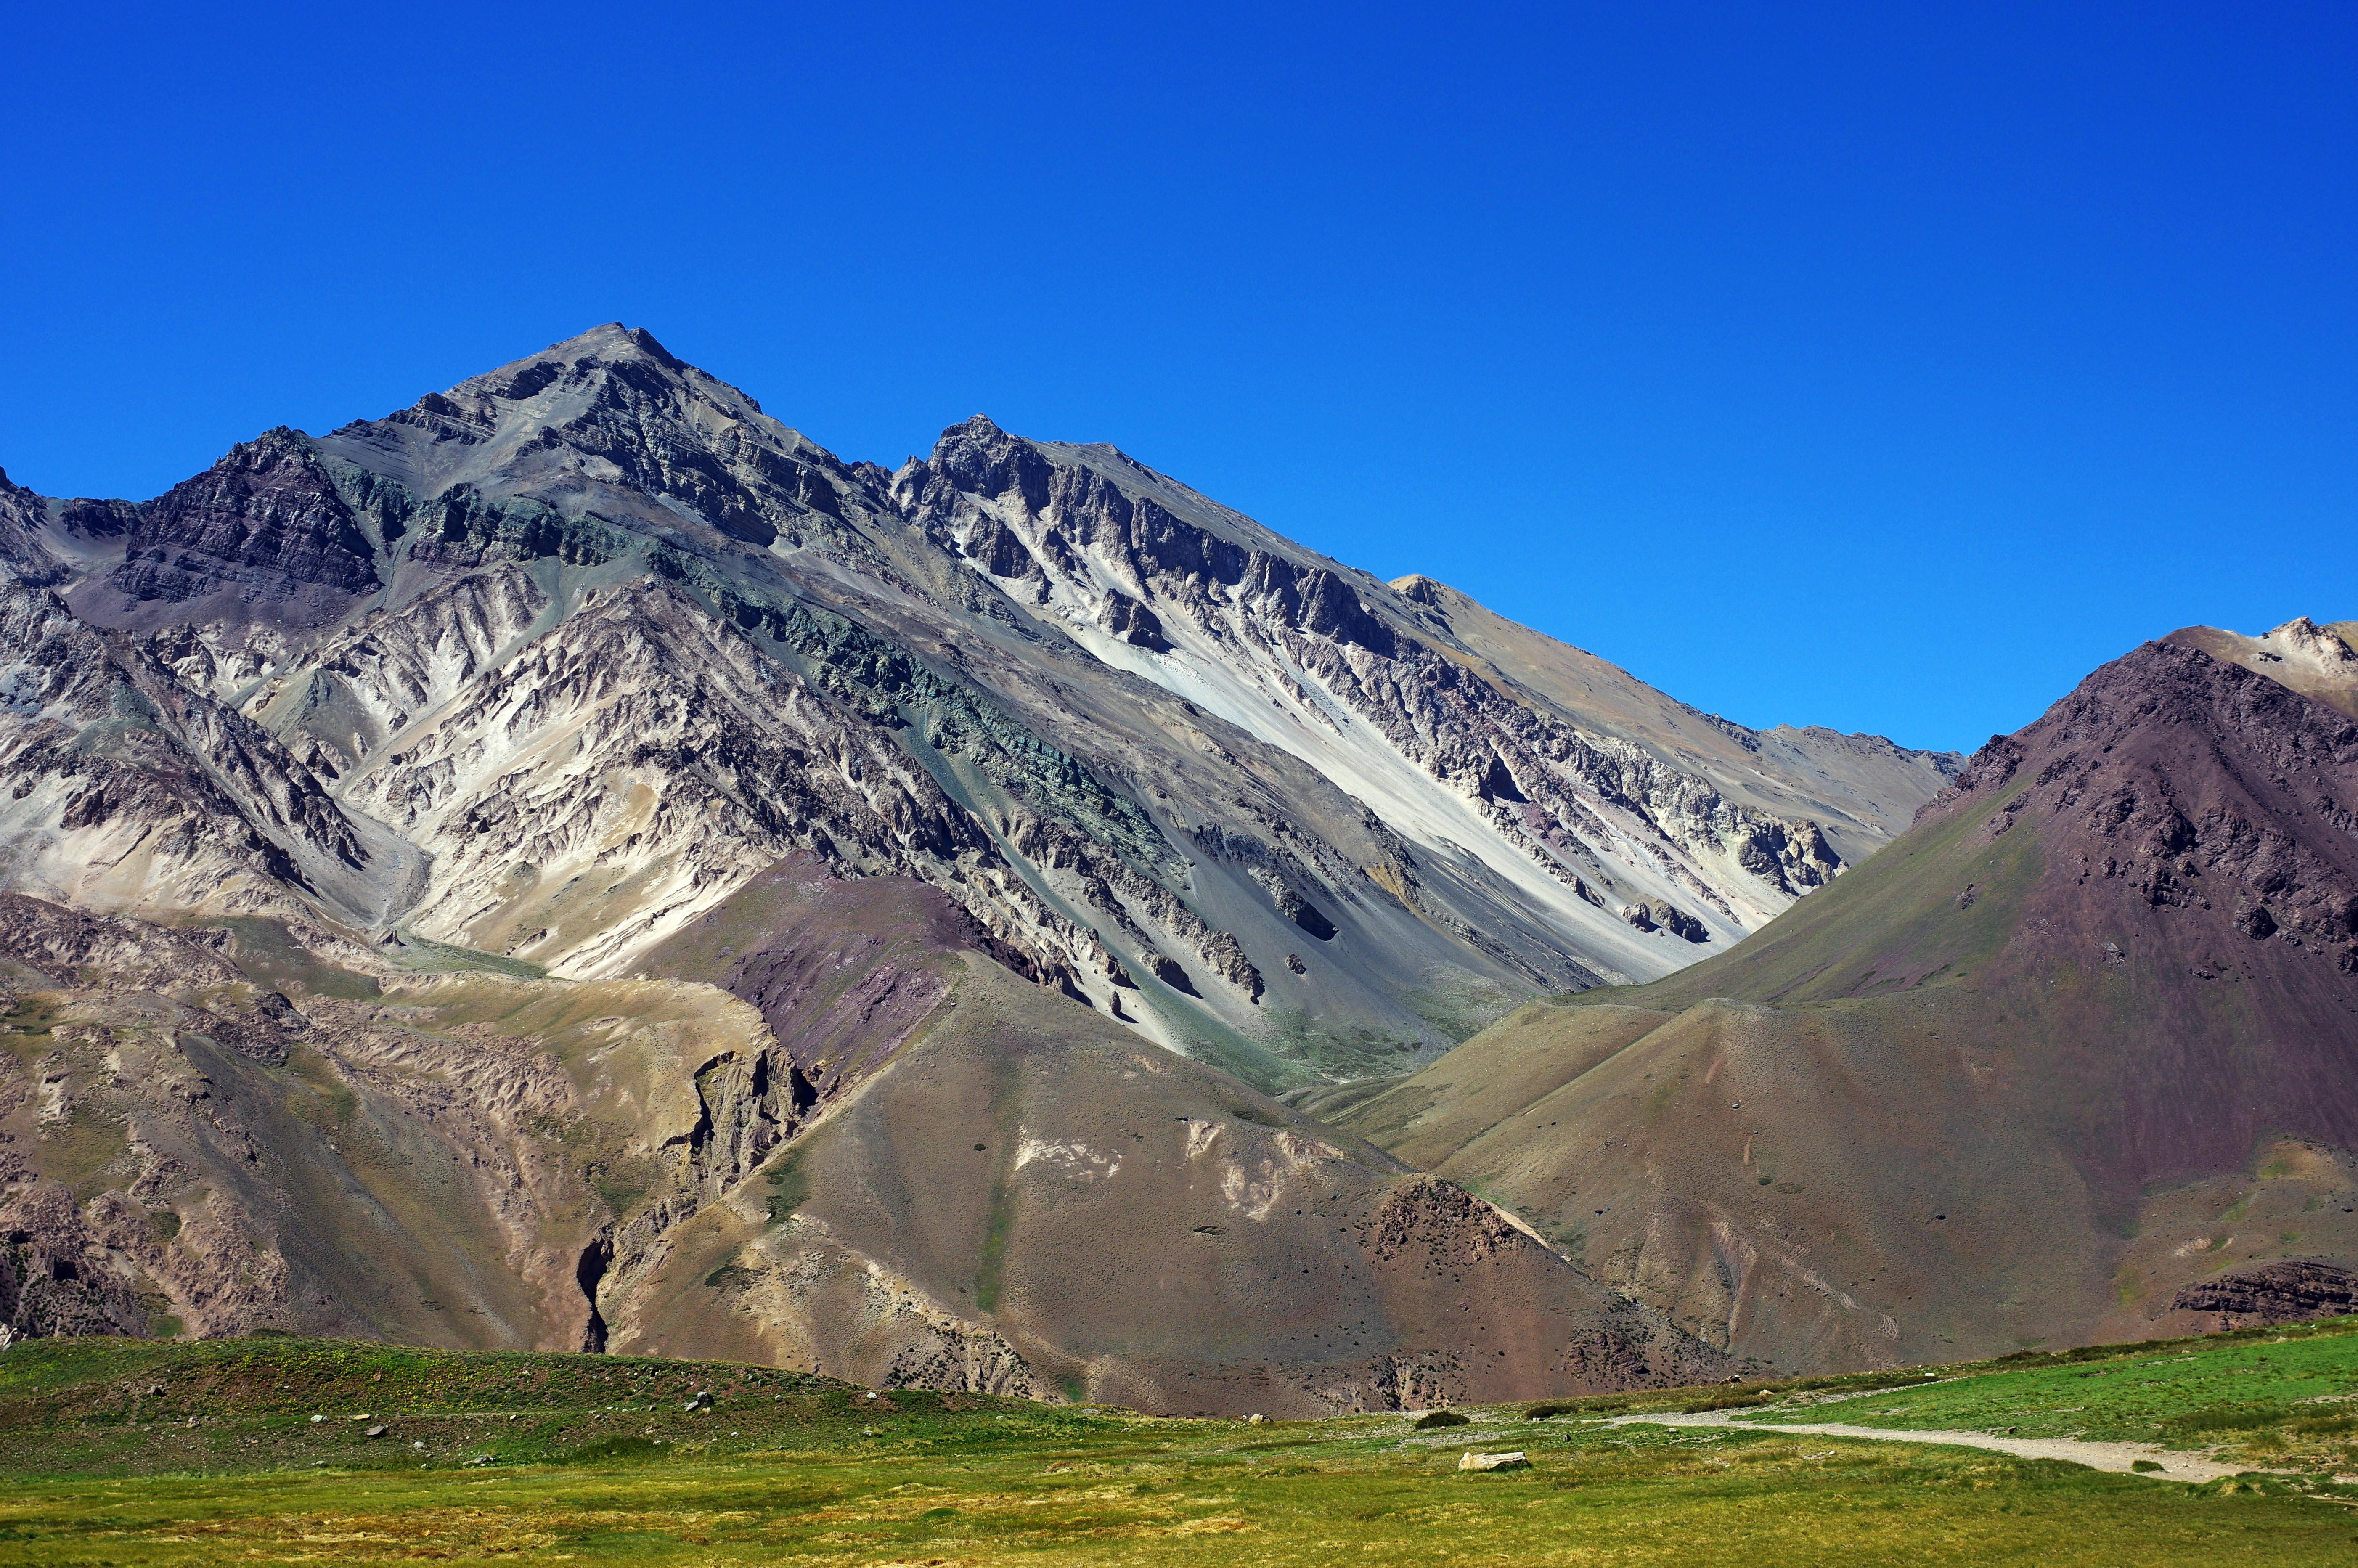 171218_Mendoza-Aconcagua23